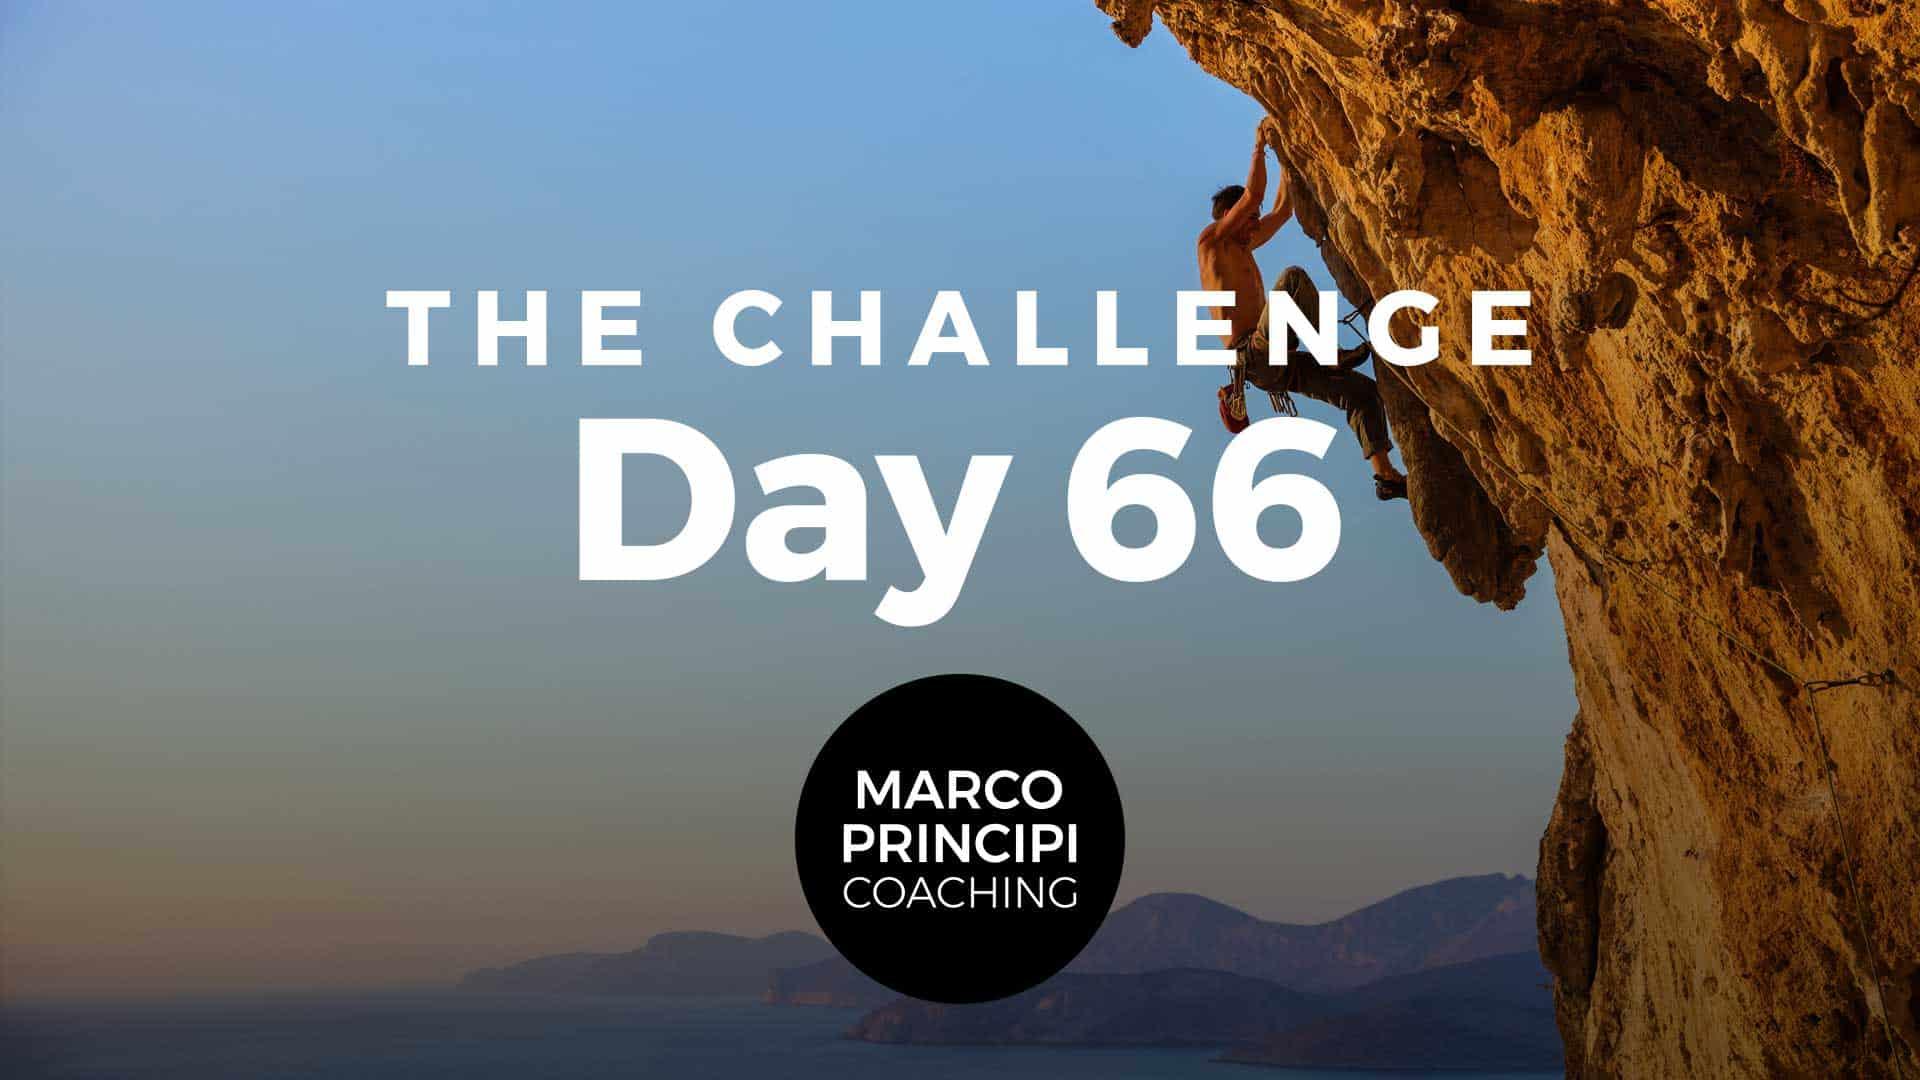 Marco Principi Coaching Challenge Day 66